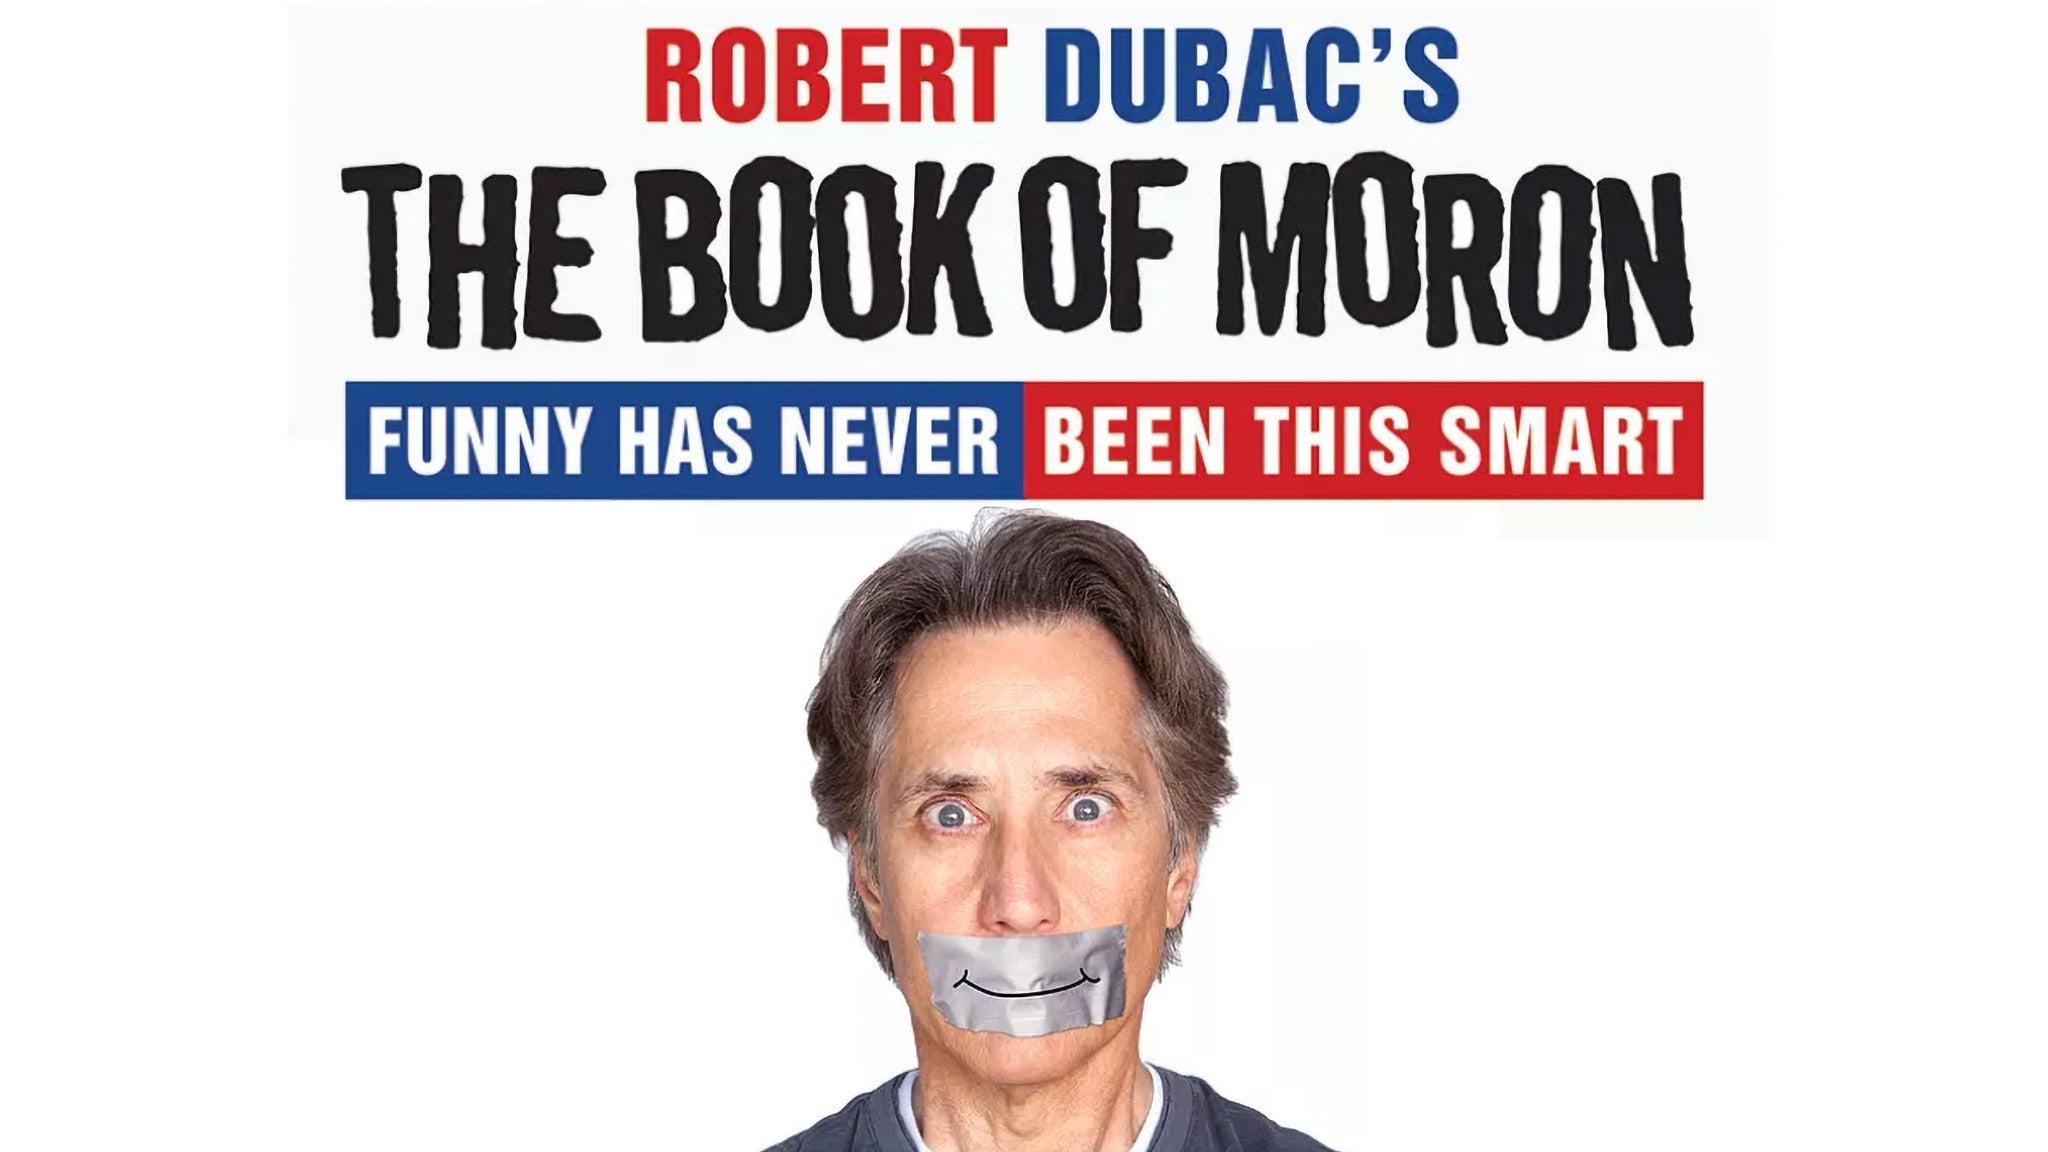 Robert Dubac's The Book of Moron